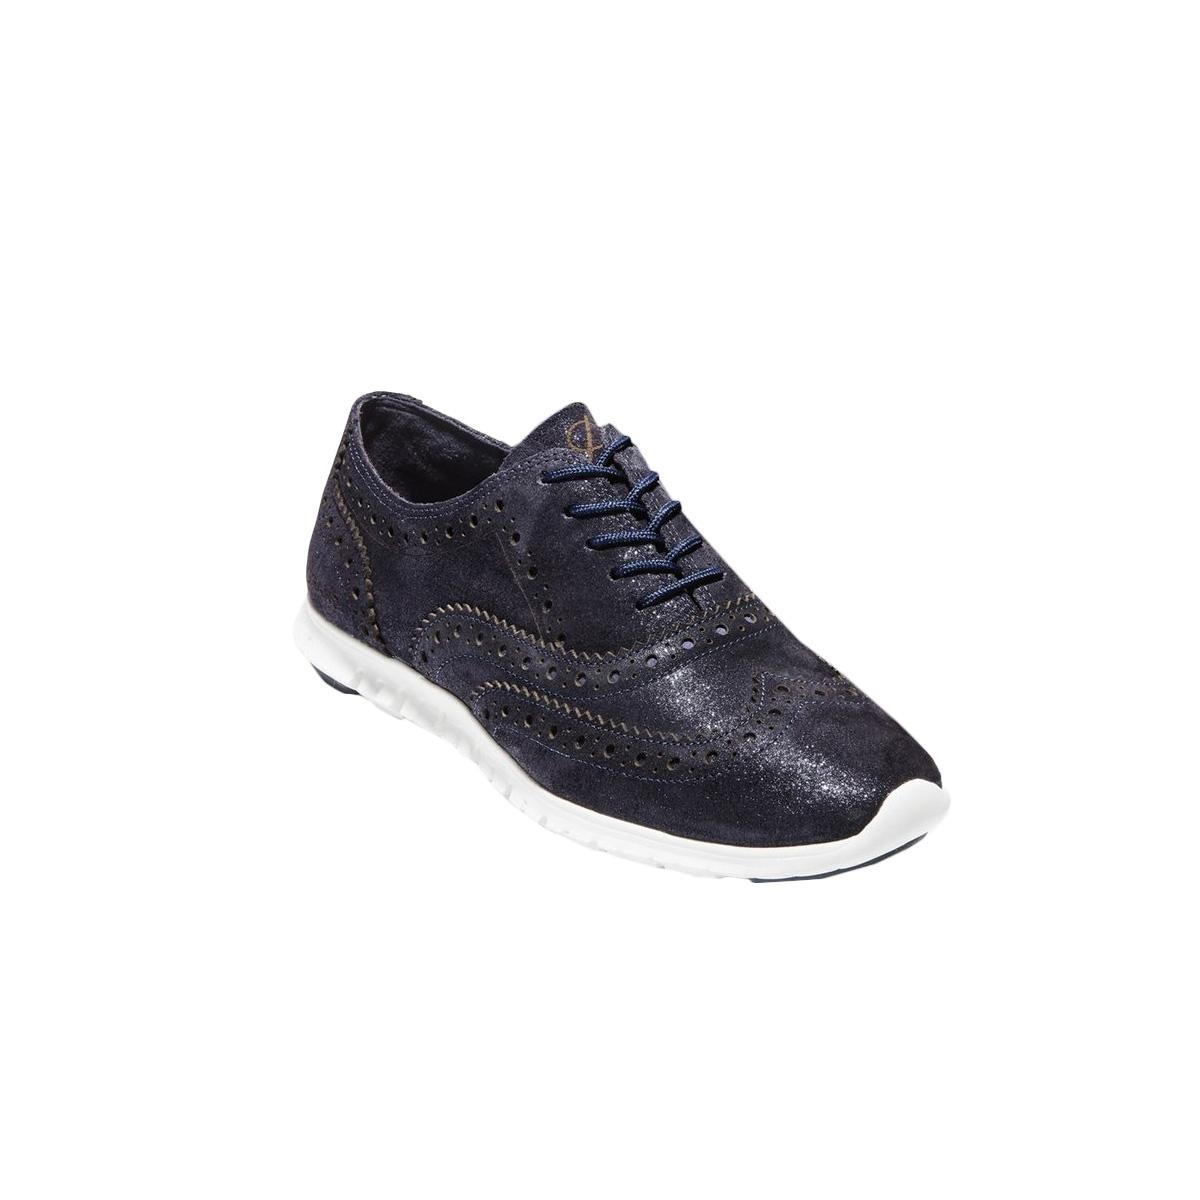 Cole Haan Womens/Ladies Zerogrand Wingtip Oxford Shoes (3 UK) (Dark Navy/White)